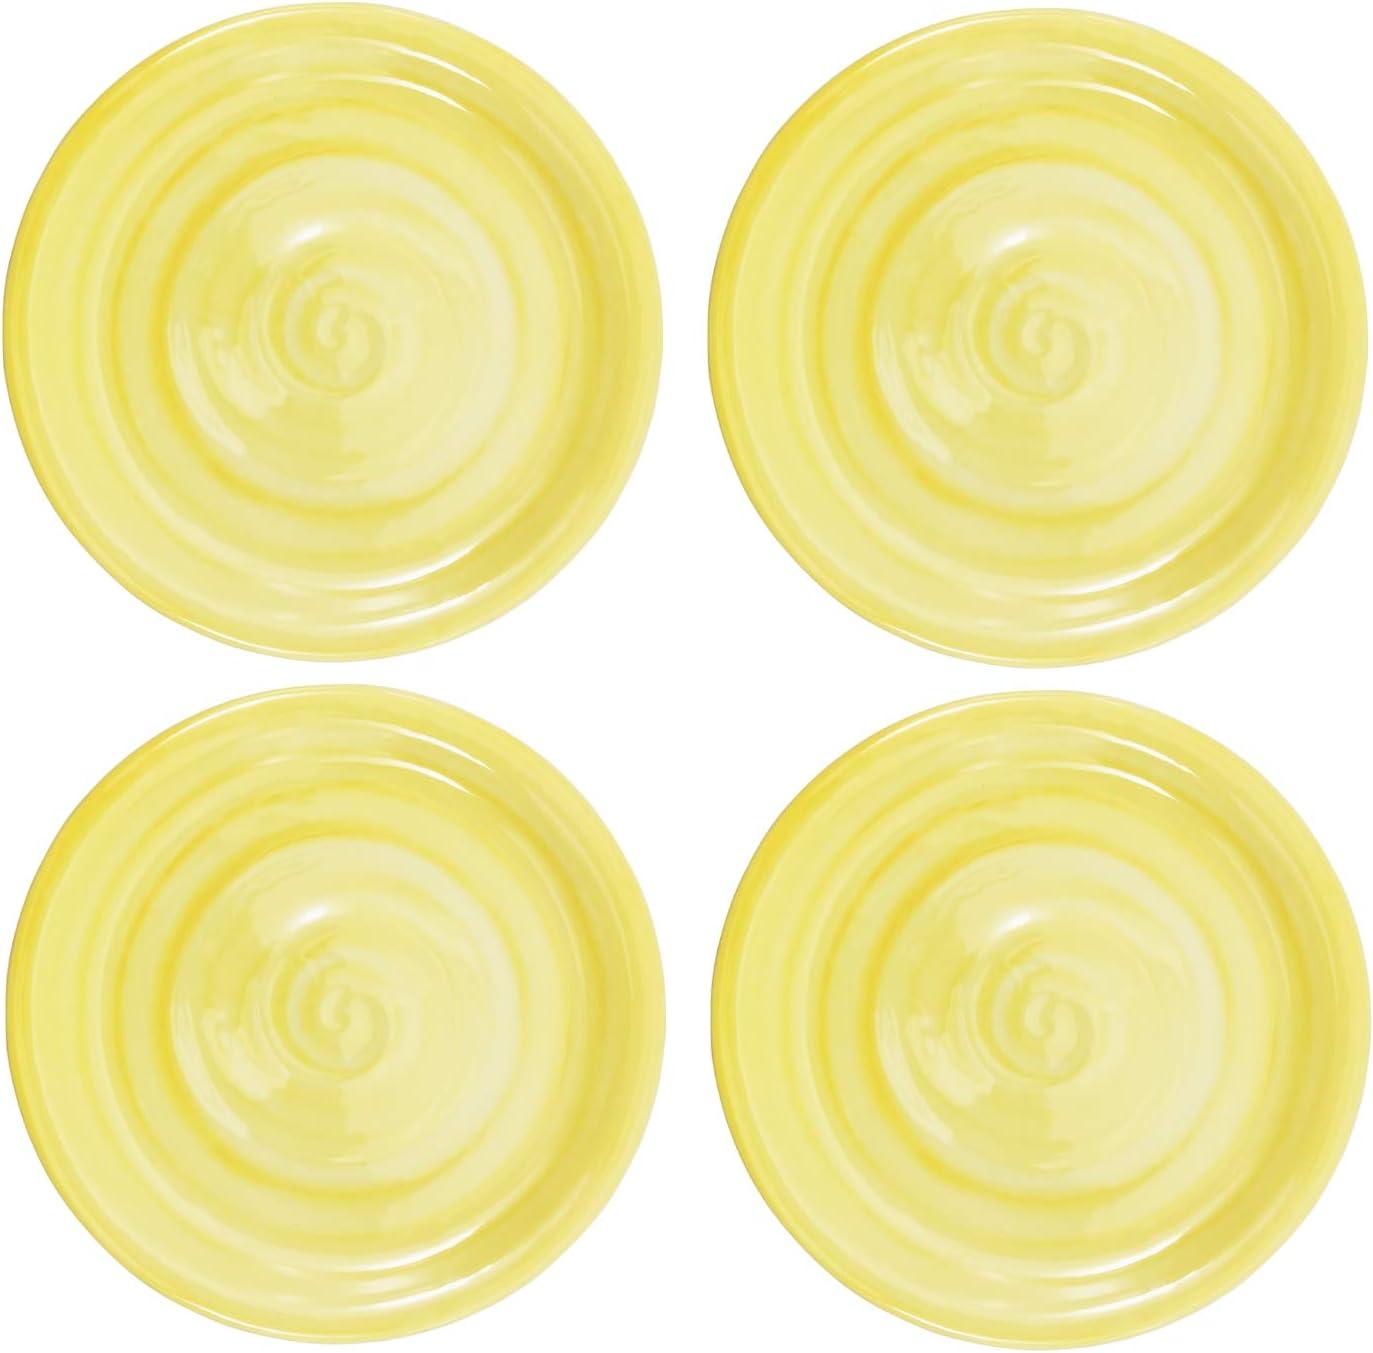 Melamine Plates, 11-inch Dinner Plates set of 4 Yellow, 100% Melamine Dishwasher Safe BPA Free